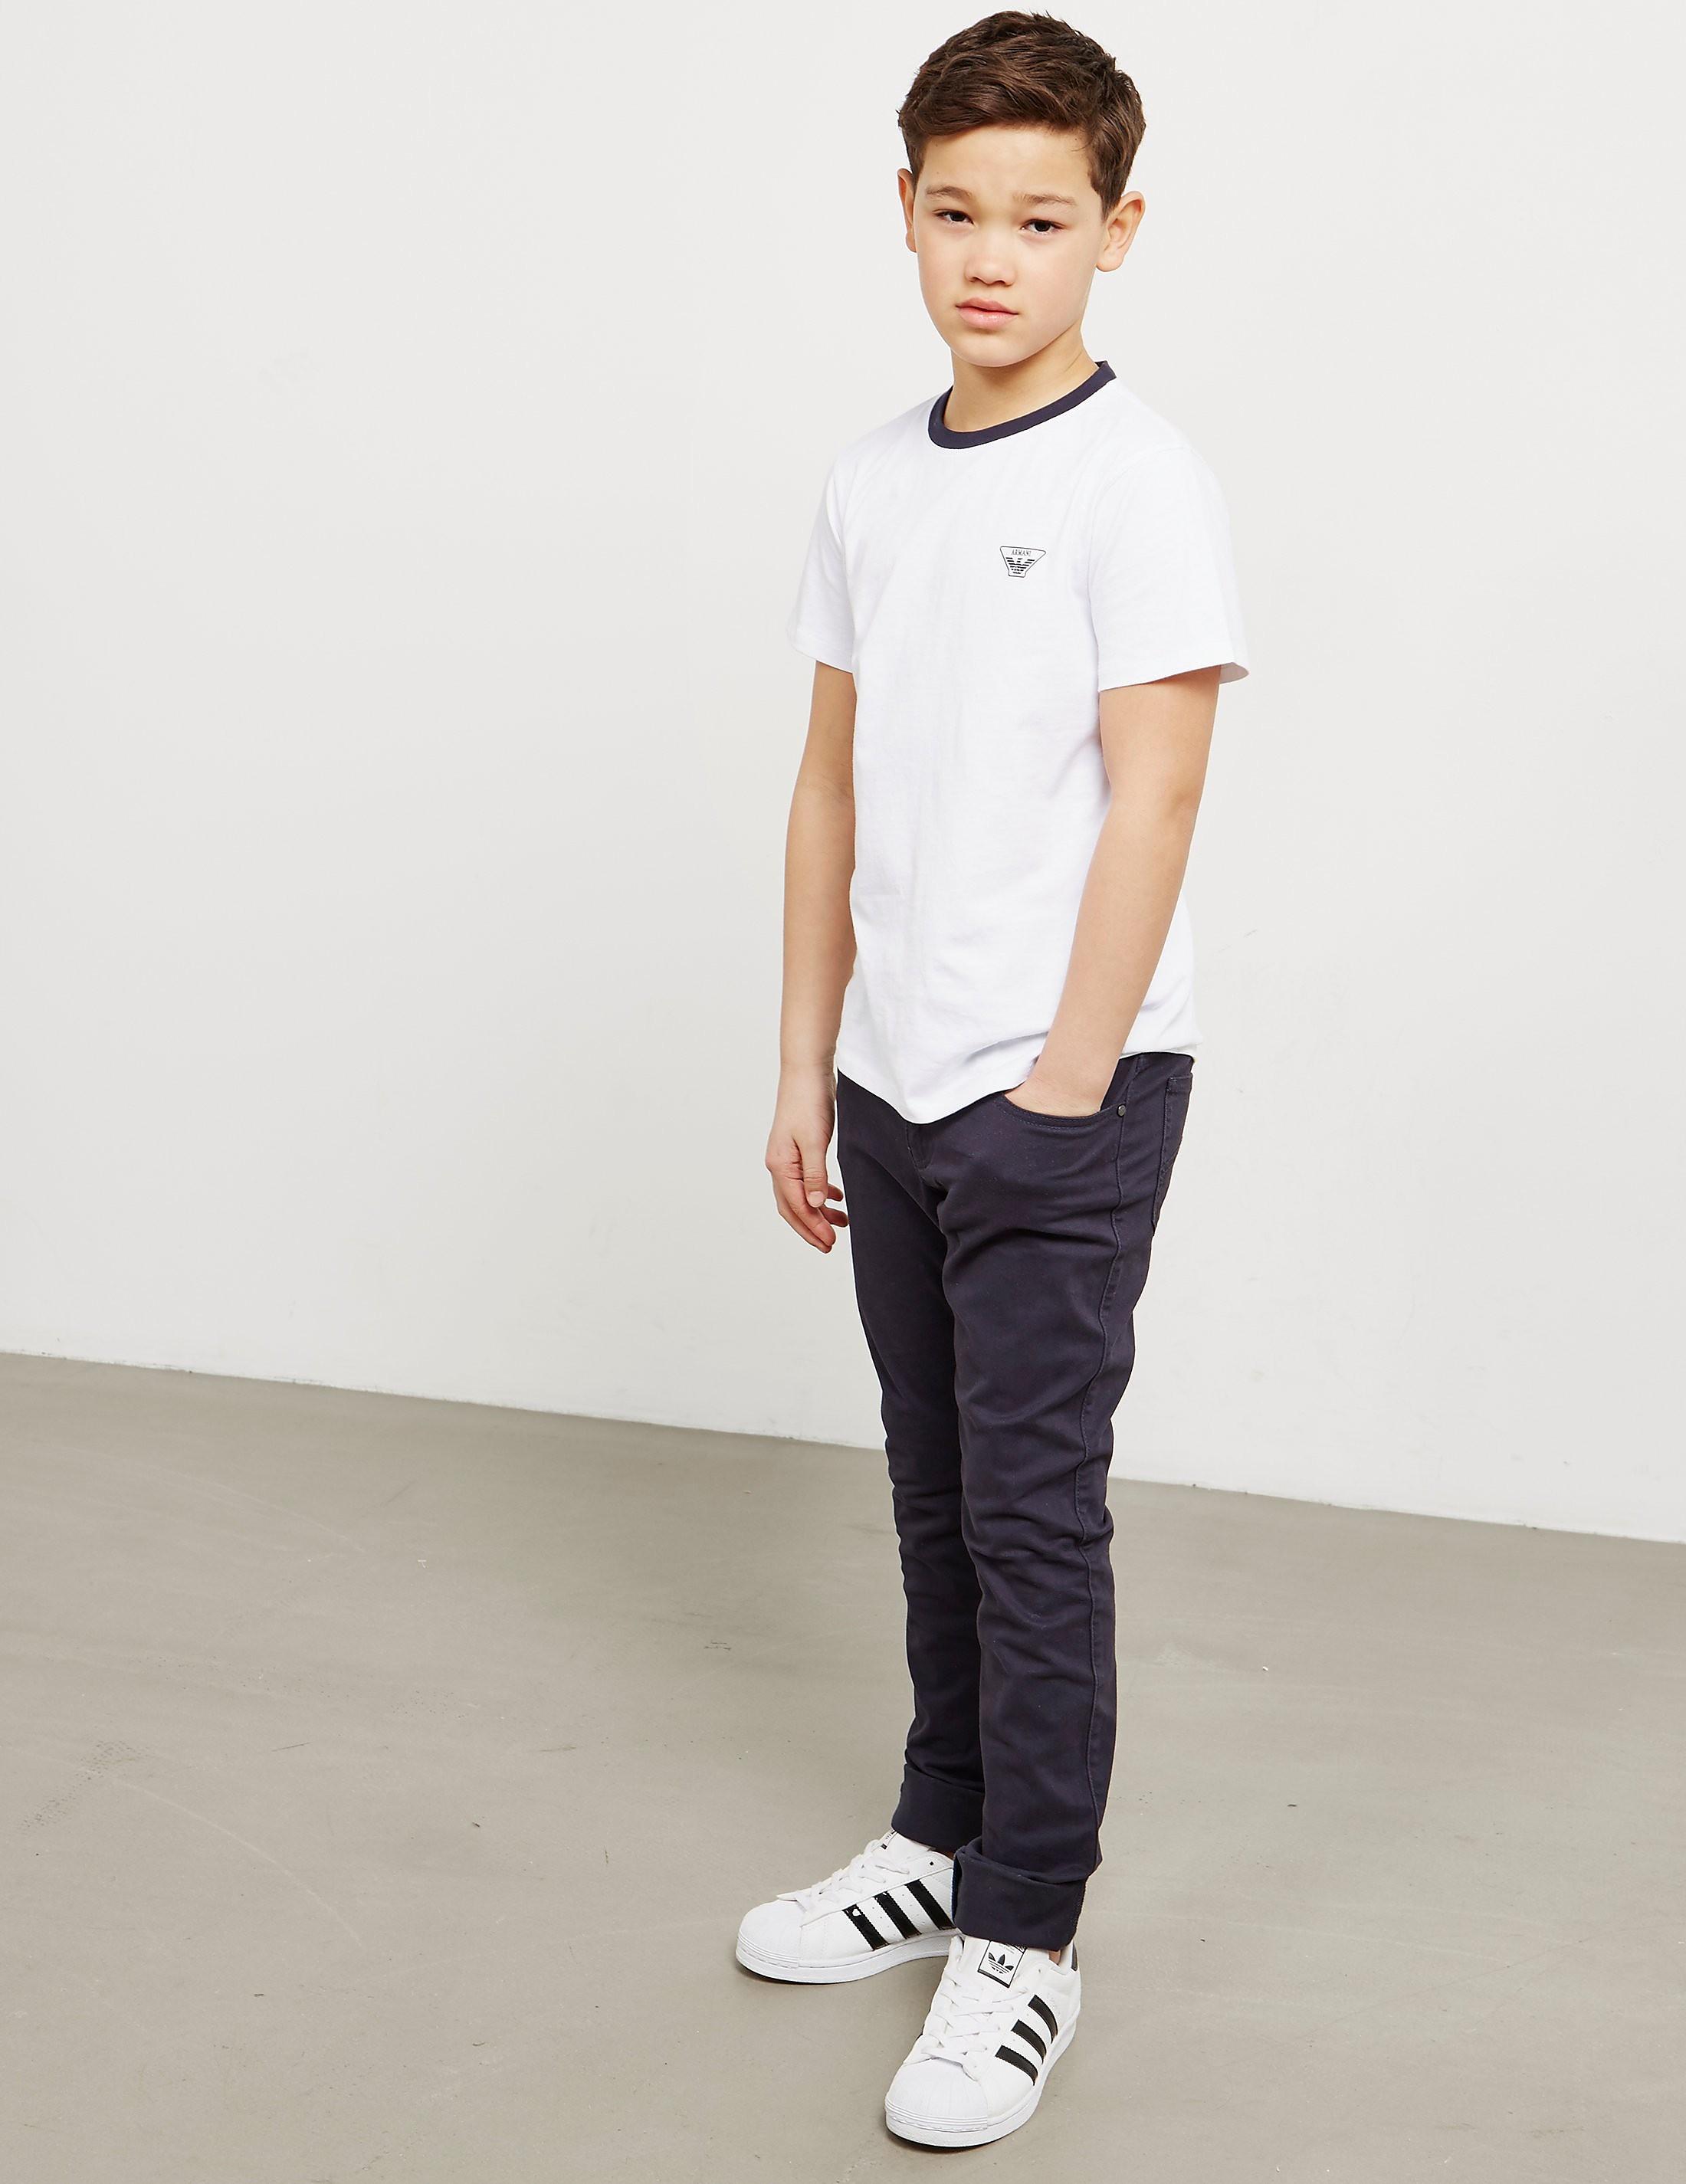 Emporio Armani Basic Short Sleeve T-Shirt